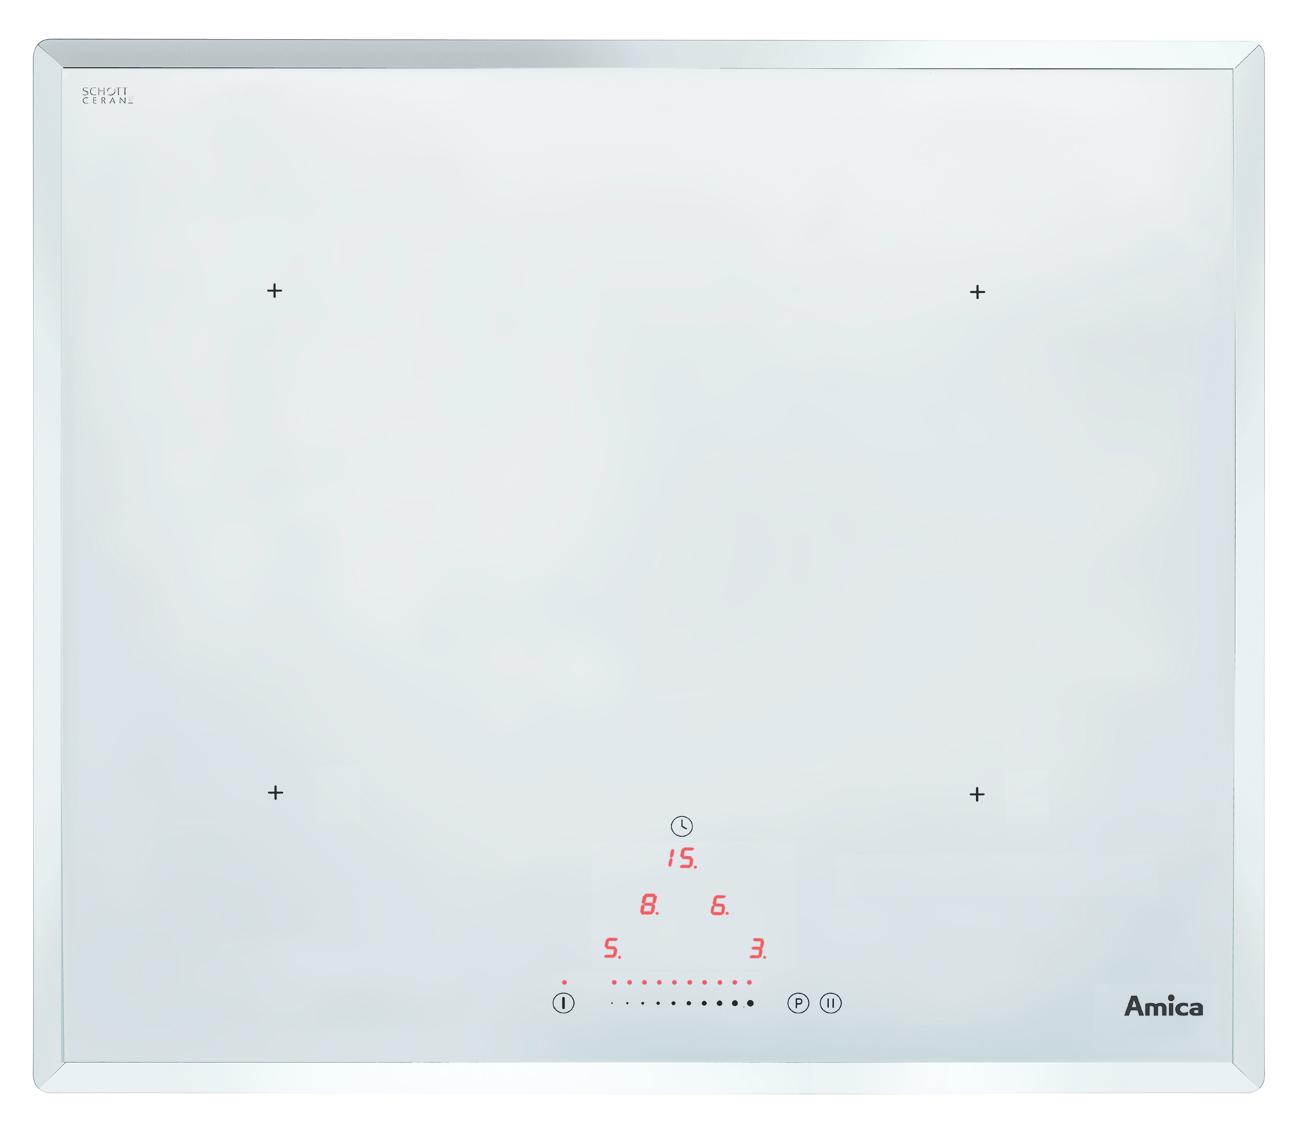 Amica induktionskochfeld kmi 13310 w designmodell in weiss for Amica induktionskochfeld